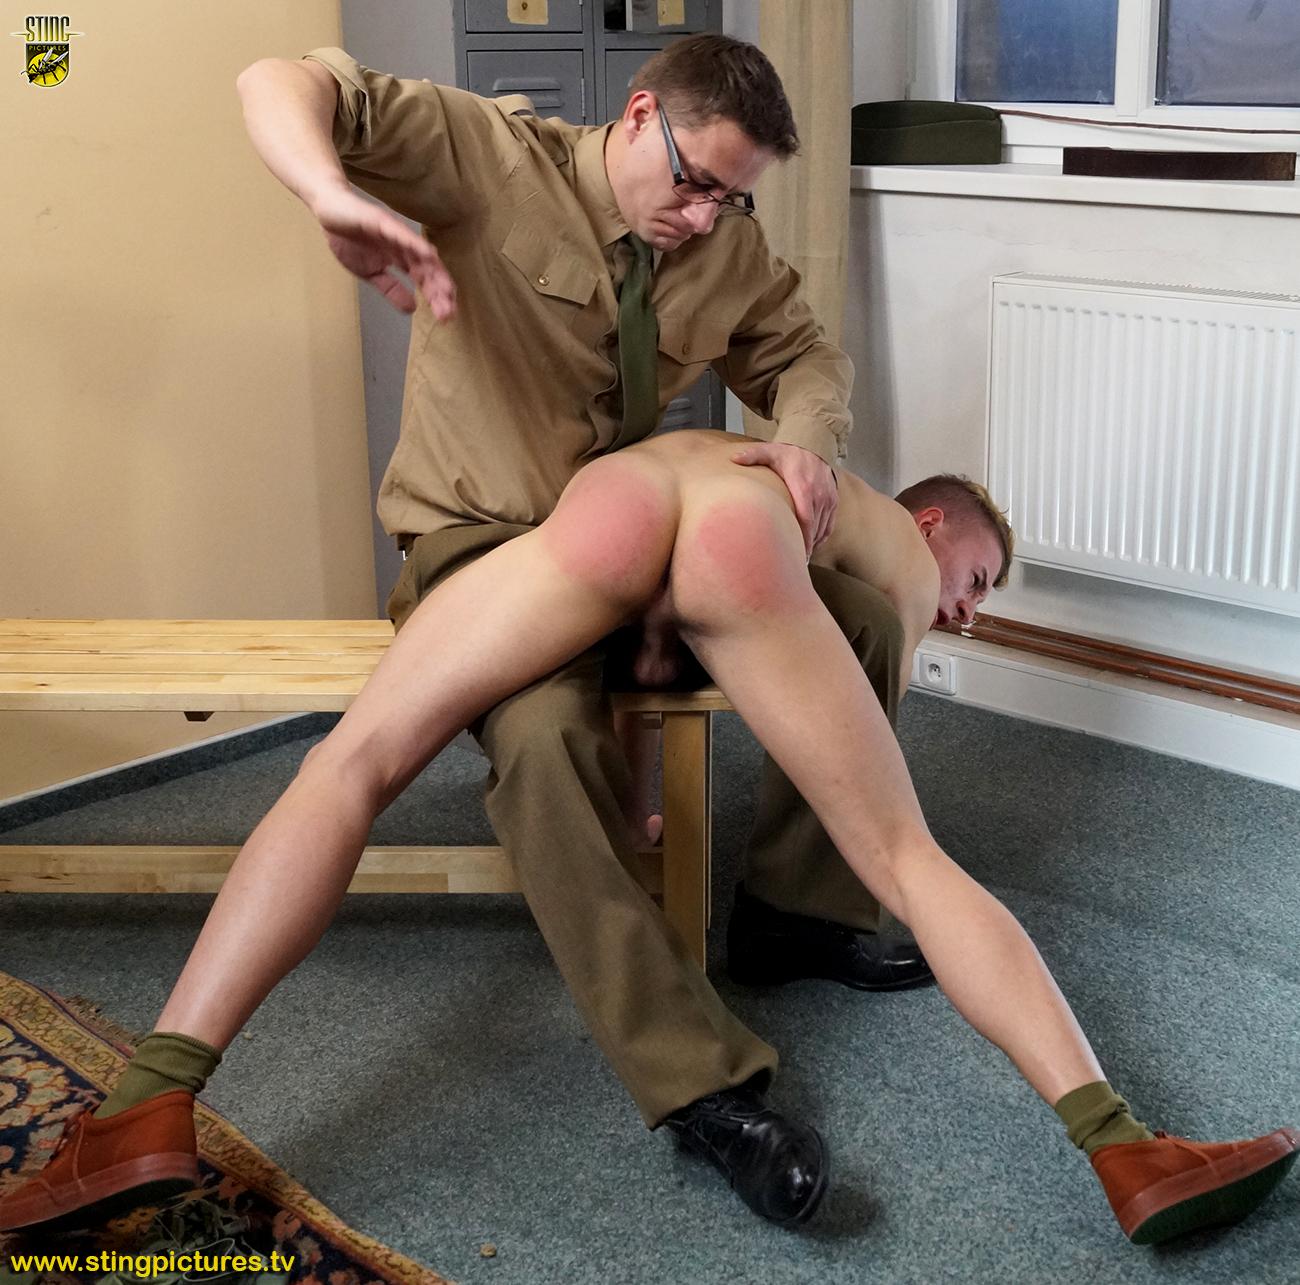 lash-flog-naked-butt-punish-army